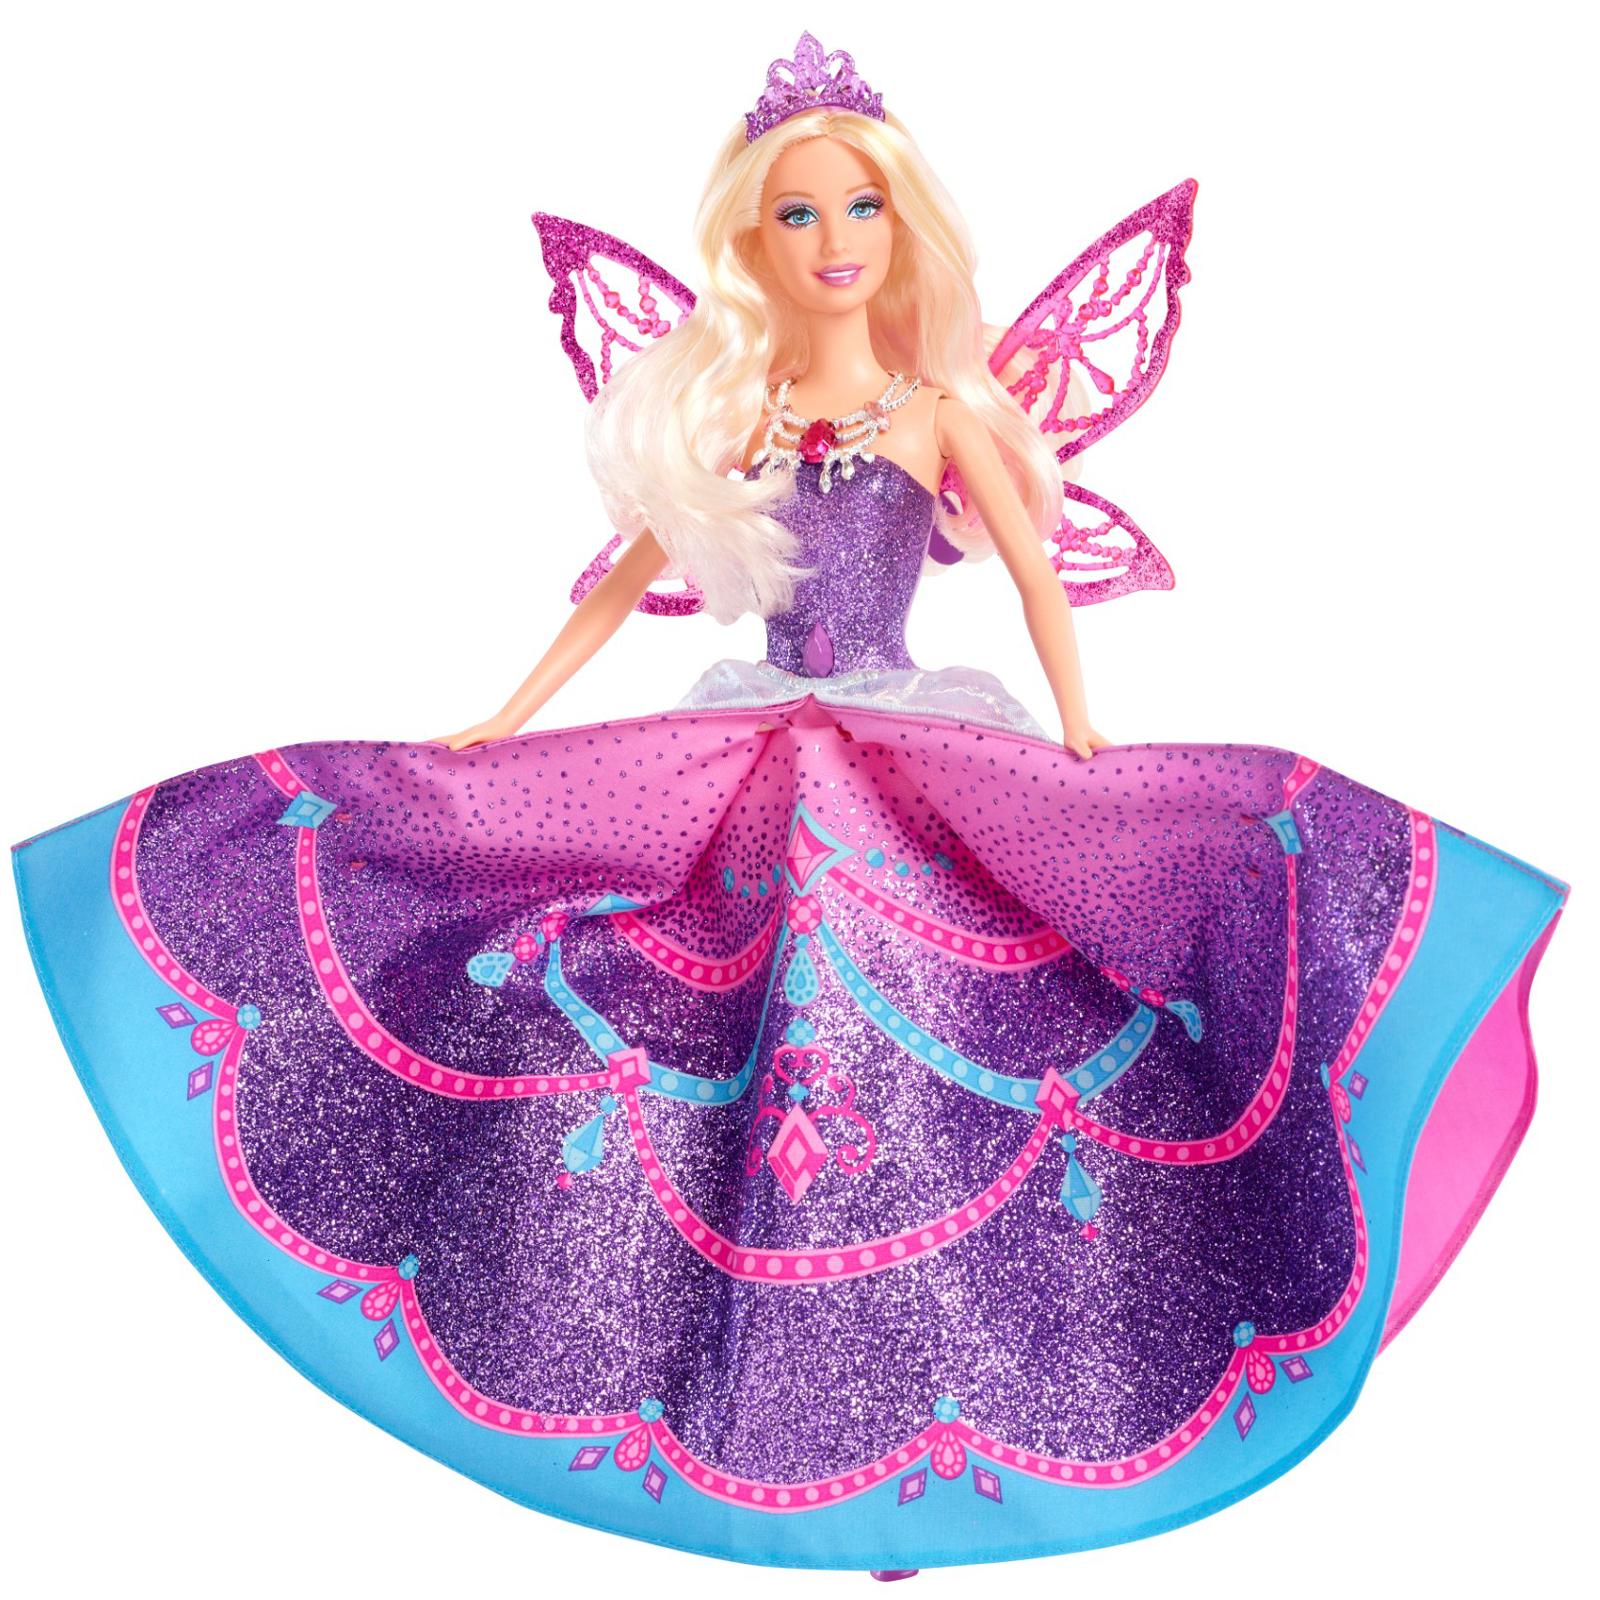 ����� Barbie ��������� ��� Catania